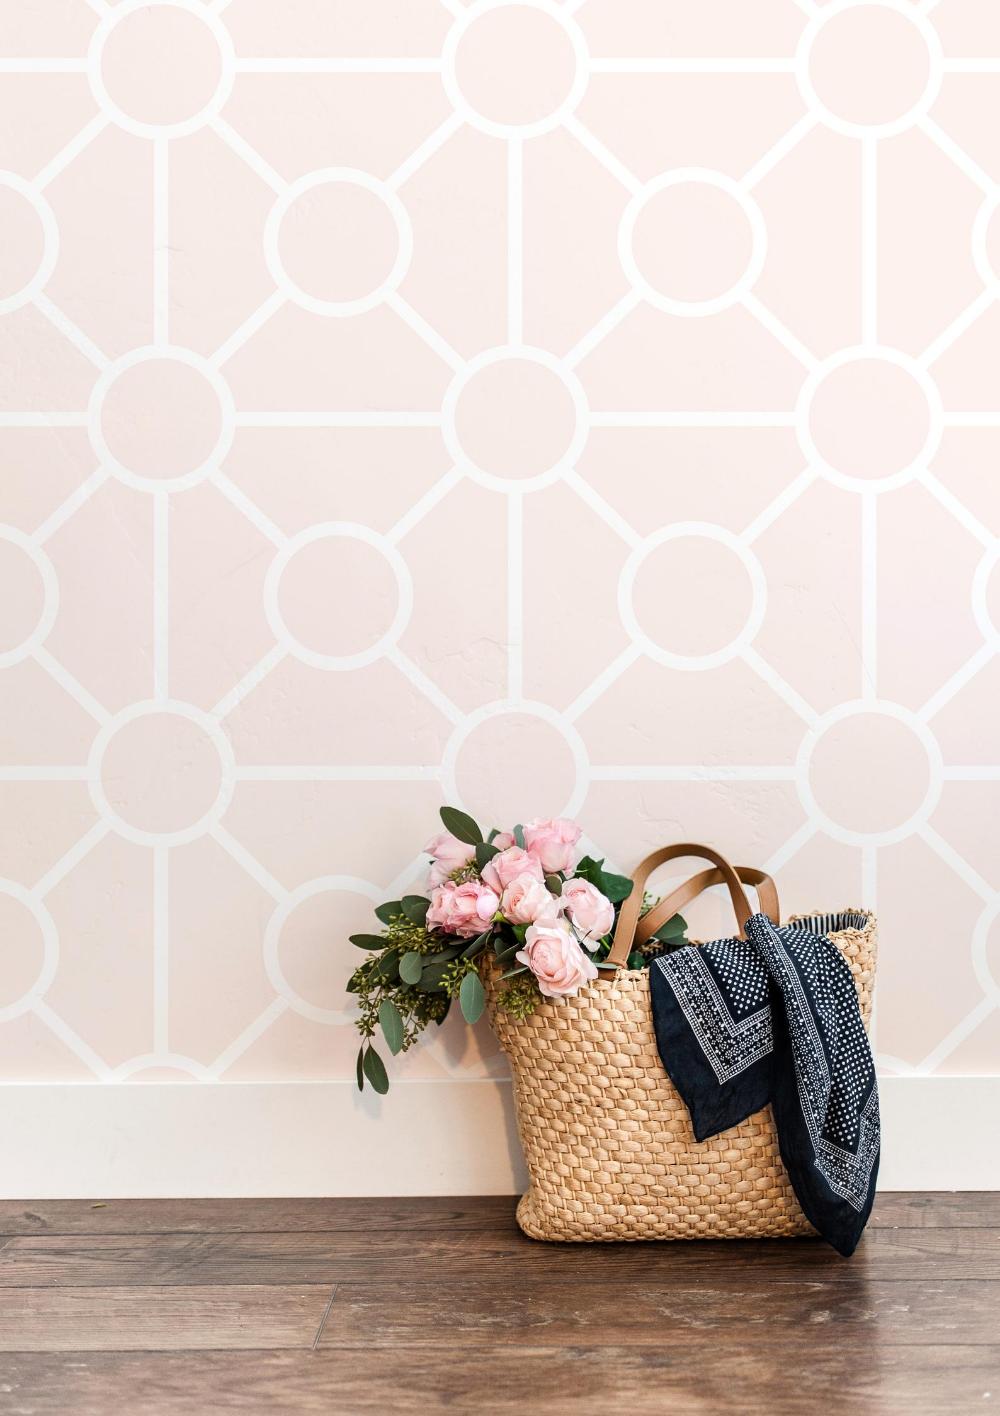 Pink Geometric Peel And Stick Wallpaper Blush Accent Wall Etsy Wallpaper Accent Wall Pink Accent Walls Peel And Stick Wallpaper